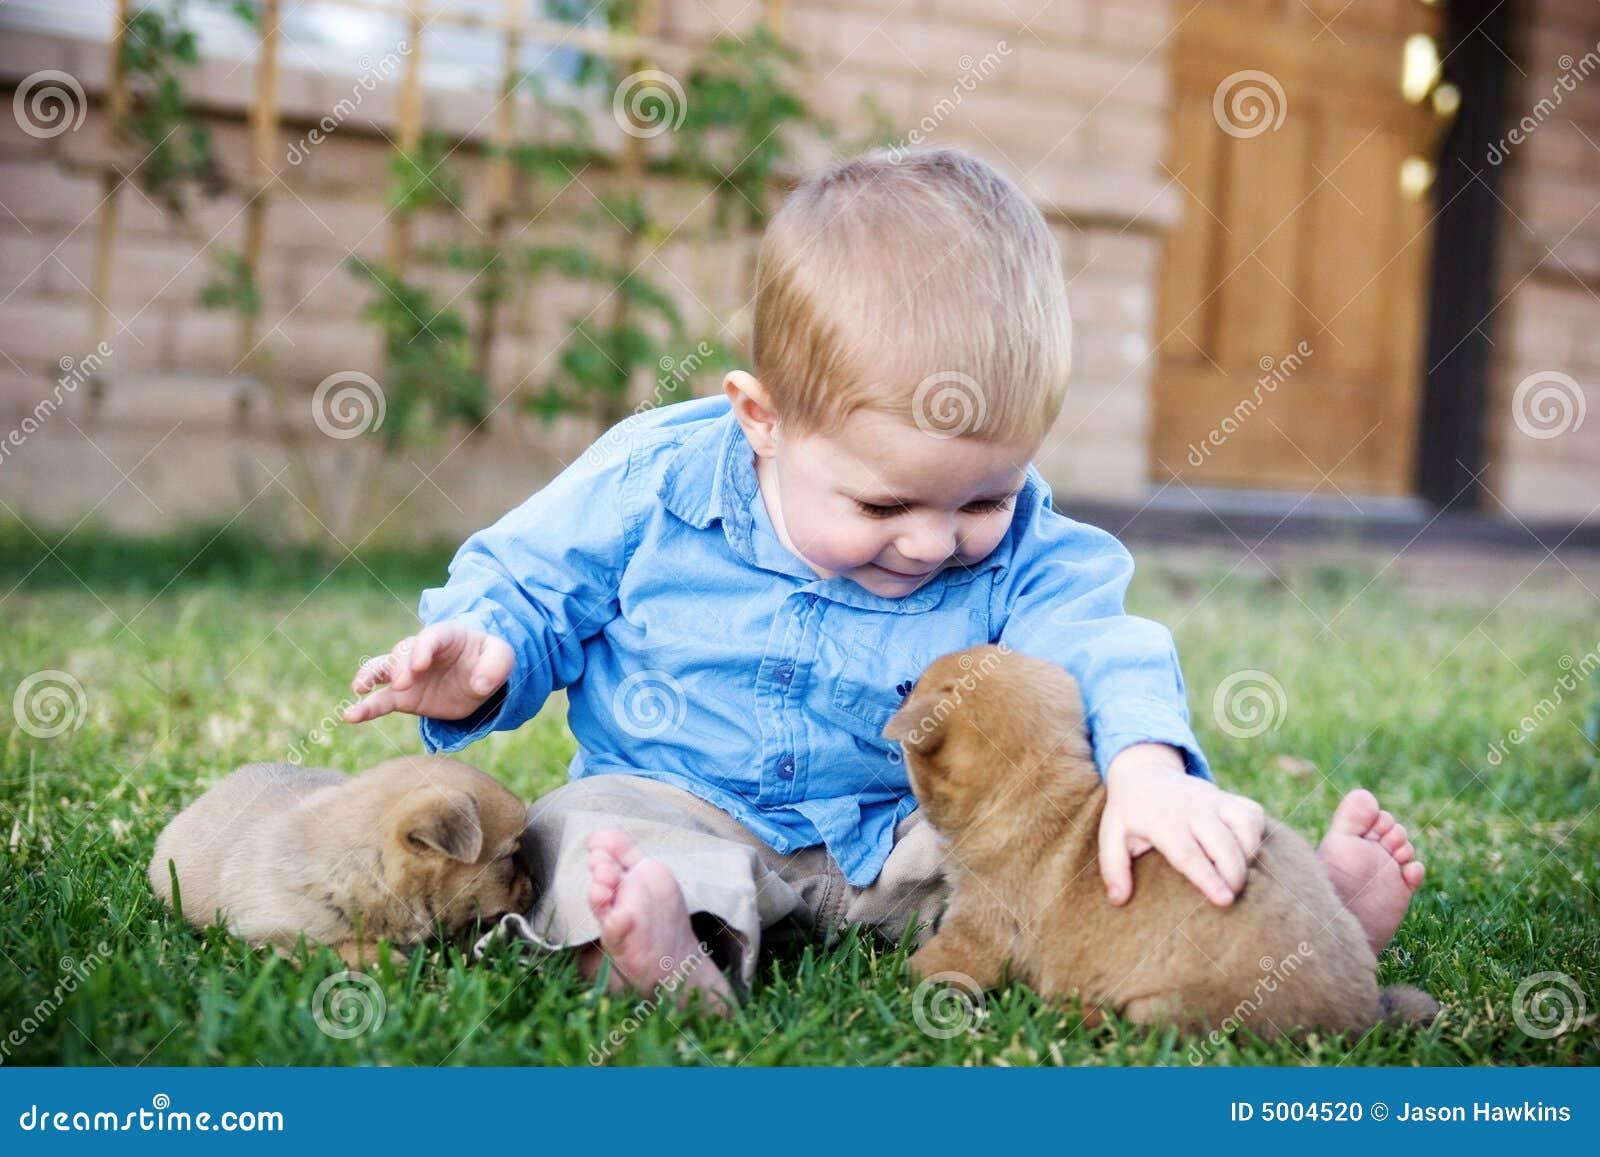 little boy petting dog stock photo   image 5004520